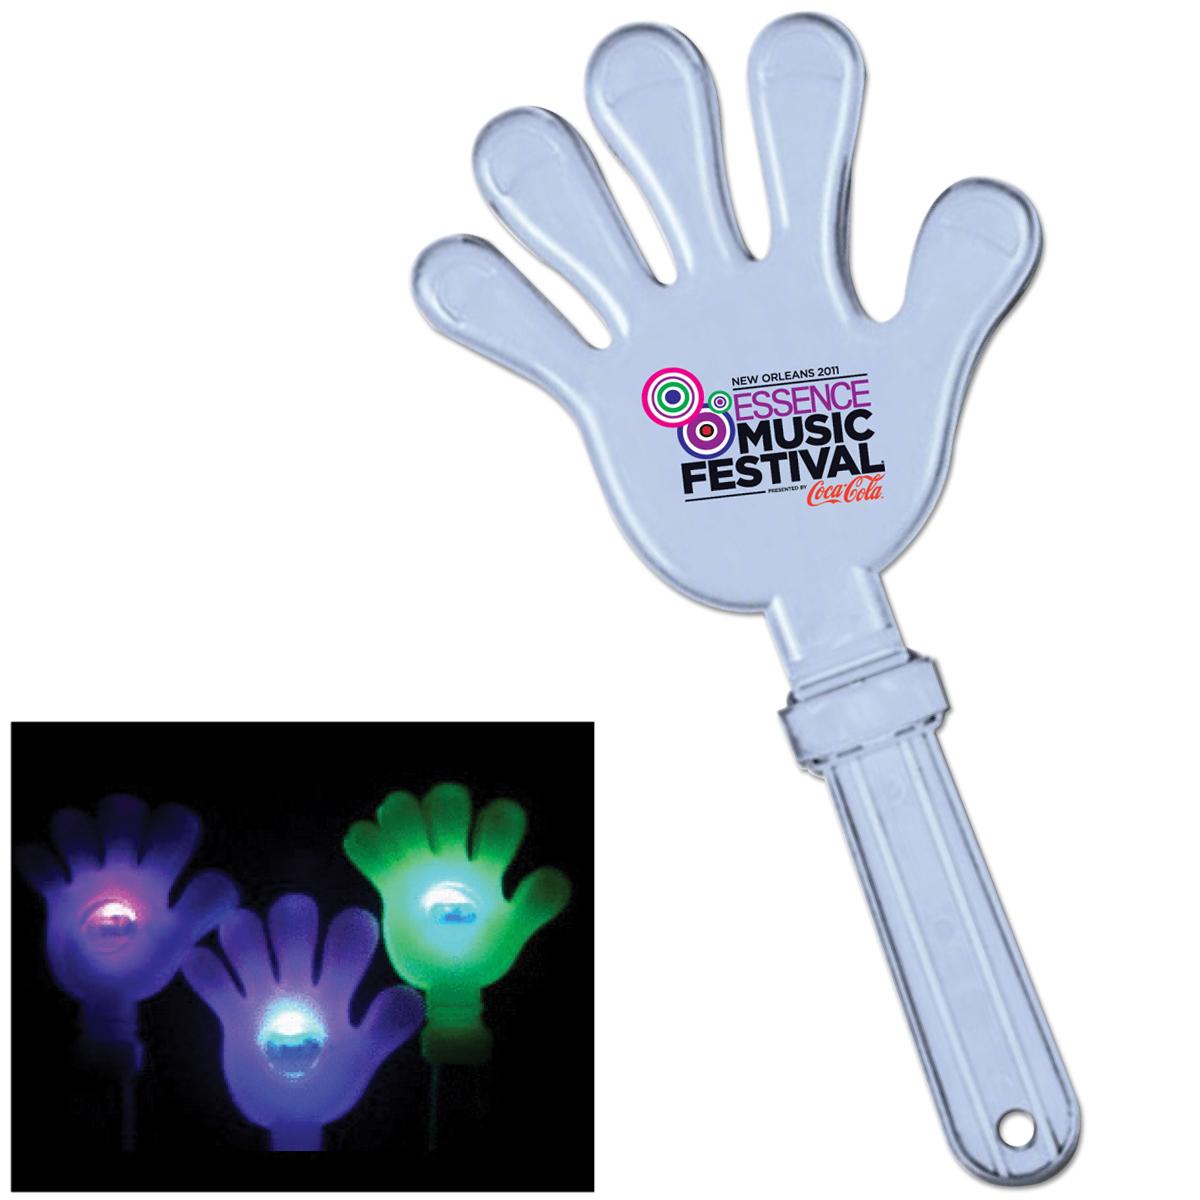 Essence Music Festival Glow in the Dark Hand Noisemaker